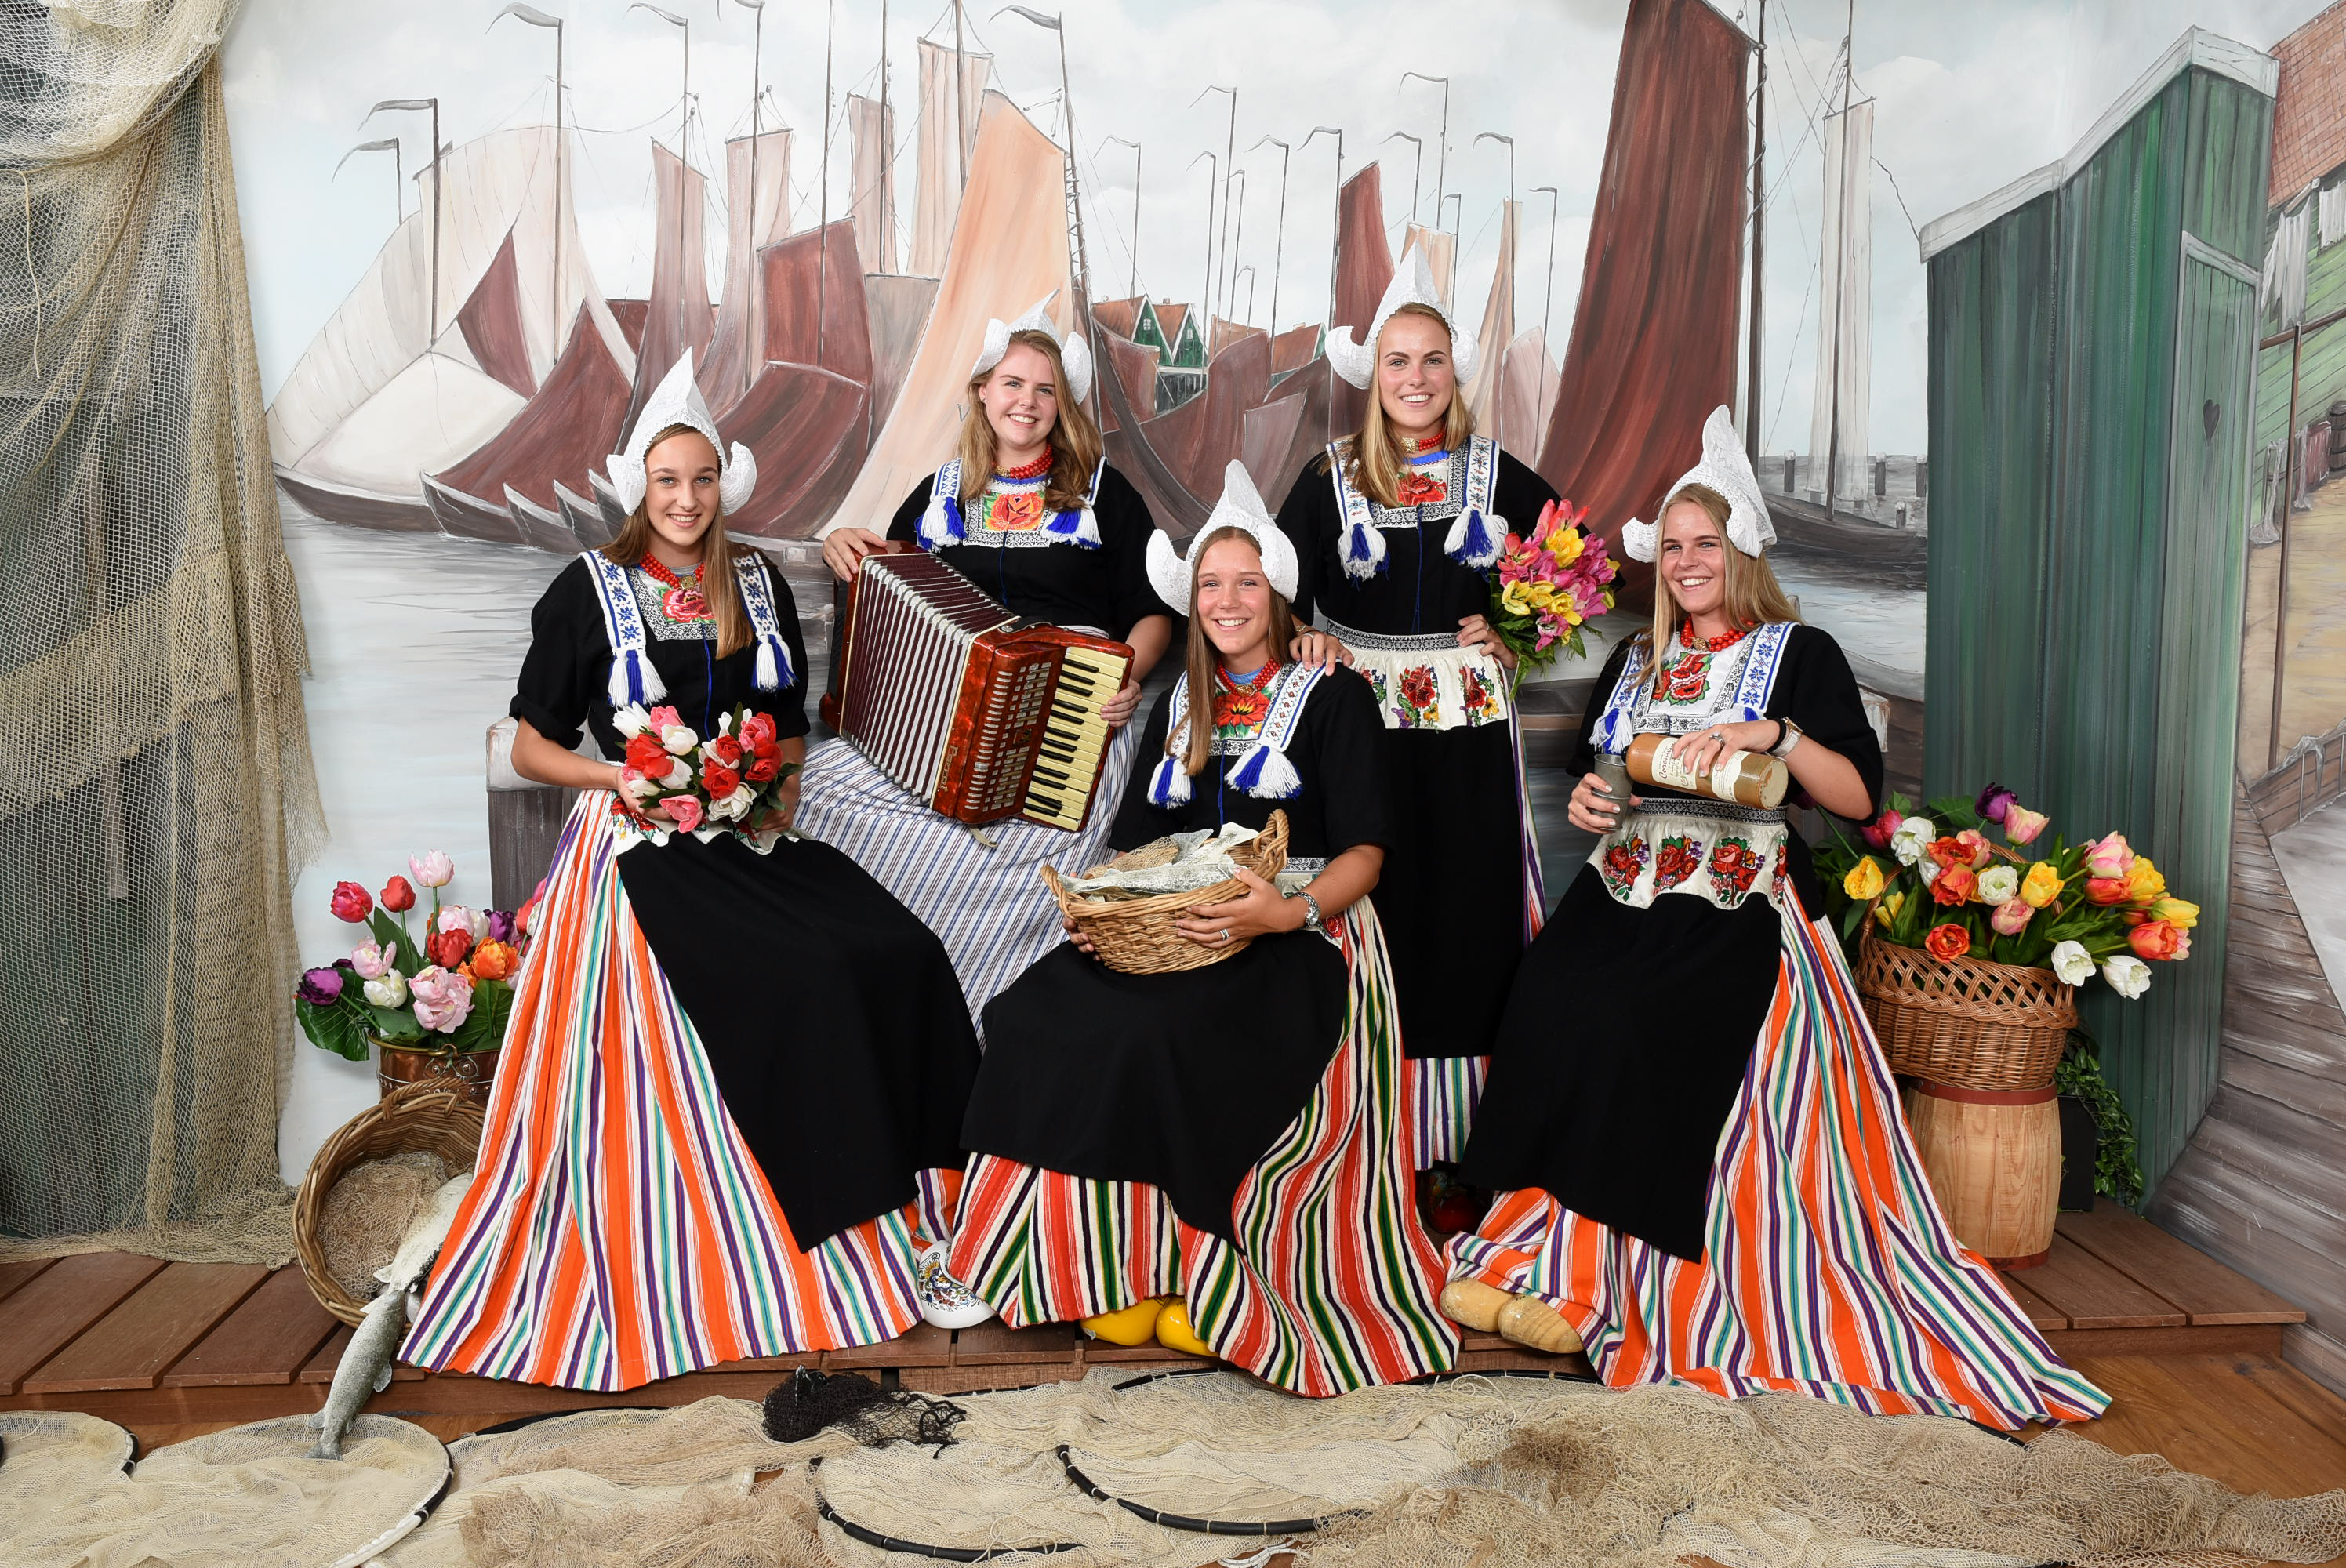 Nieuw Foto in Klederdracht - Experience Volendam Foto in klederdracht KQ-78